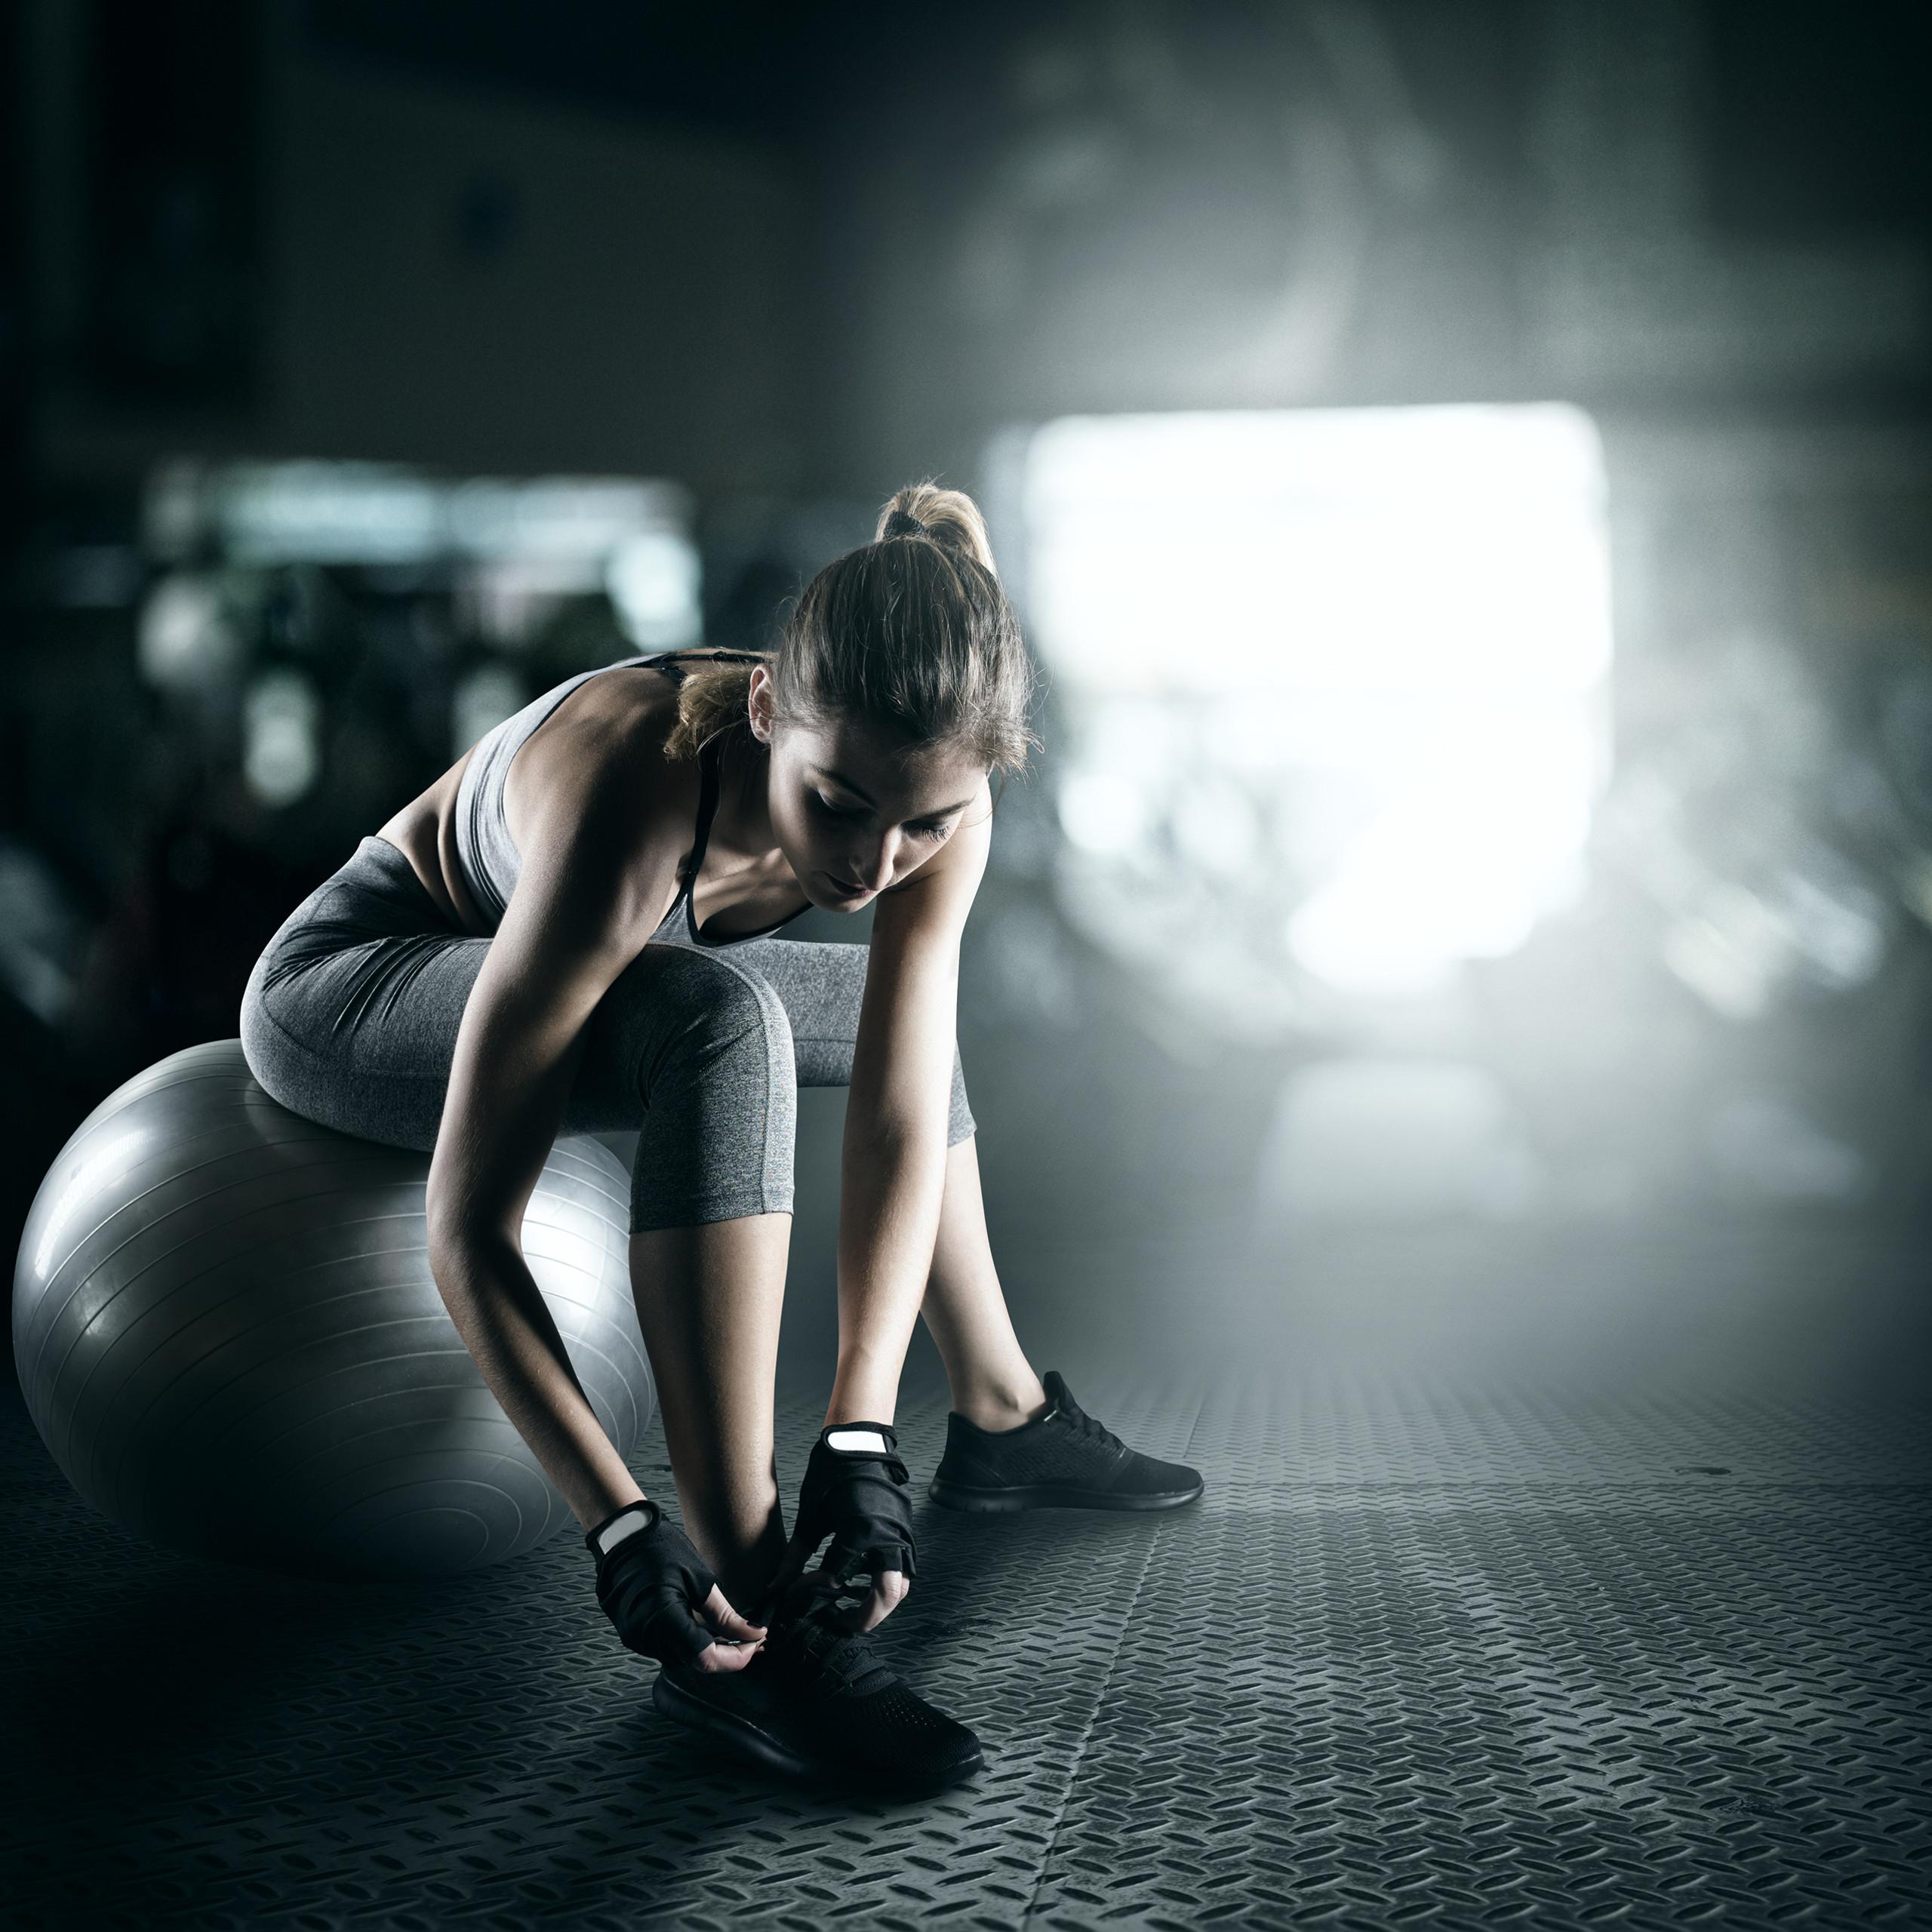 Exercise-Ball-75-cm-PVC-Yoga-Ball-Office-Seat-Gym-Ball-Pilates thumbnail 24